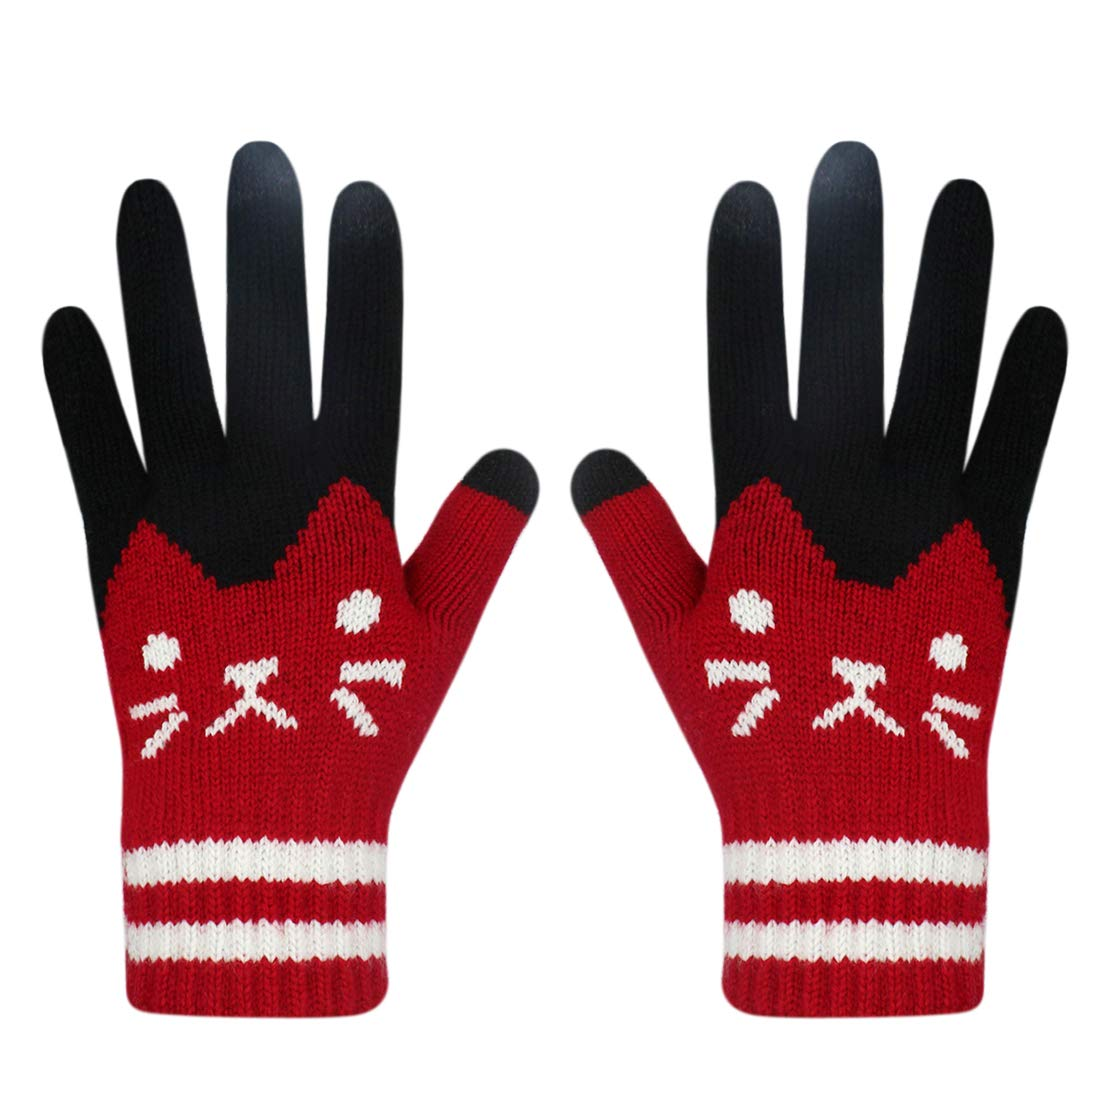 Women Men Winter Touch Screen Gloves Cat Warm Knit Texting Gloves Touchscreen Mittens Aimeio